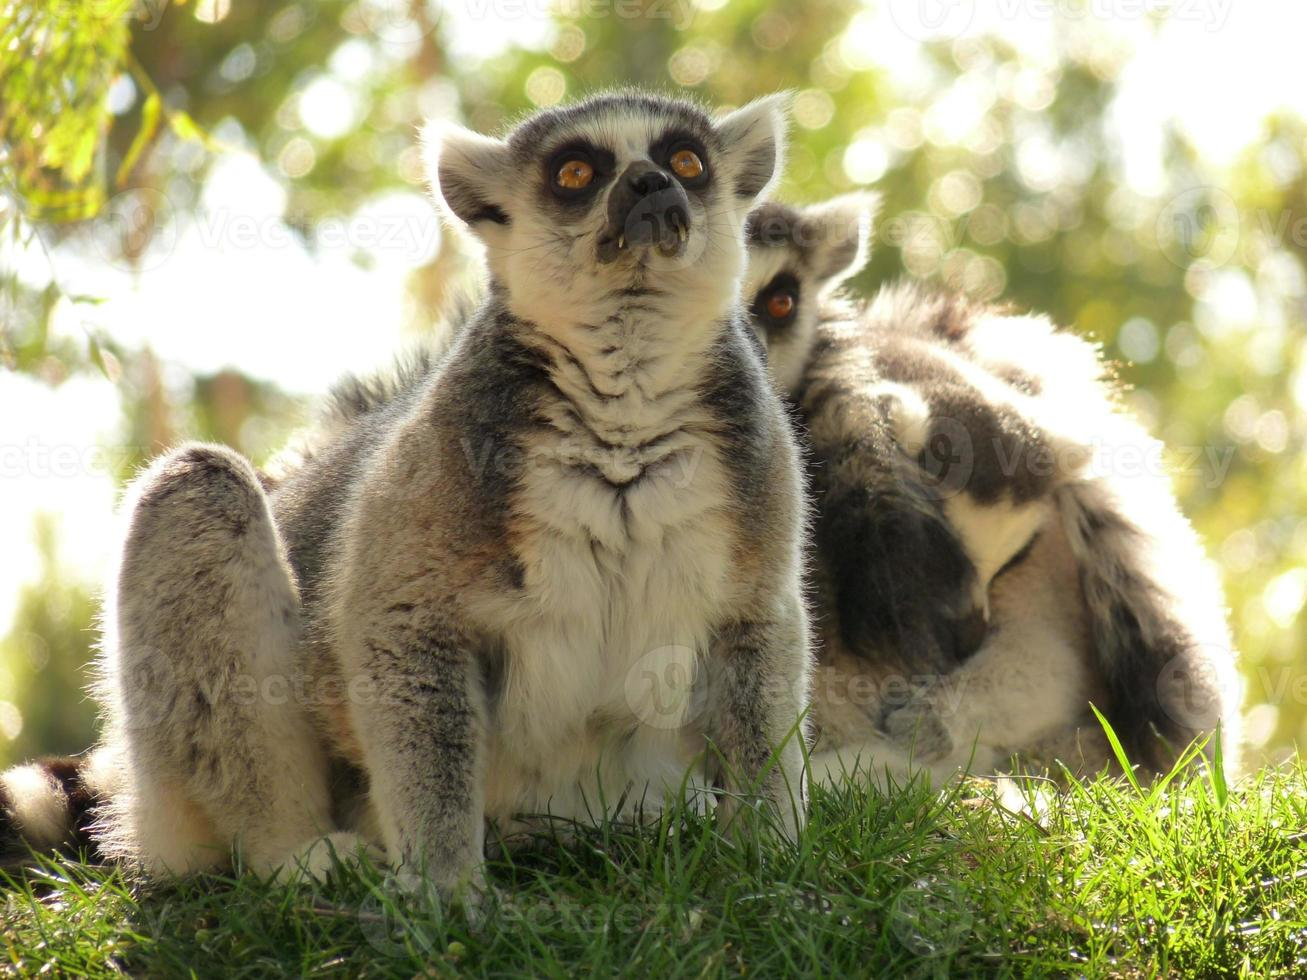 dos lémures sentados en el césped foto